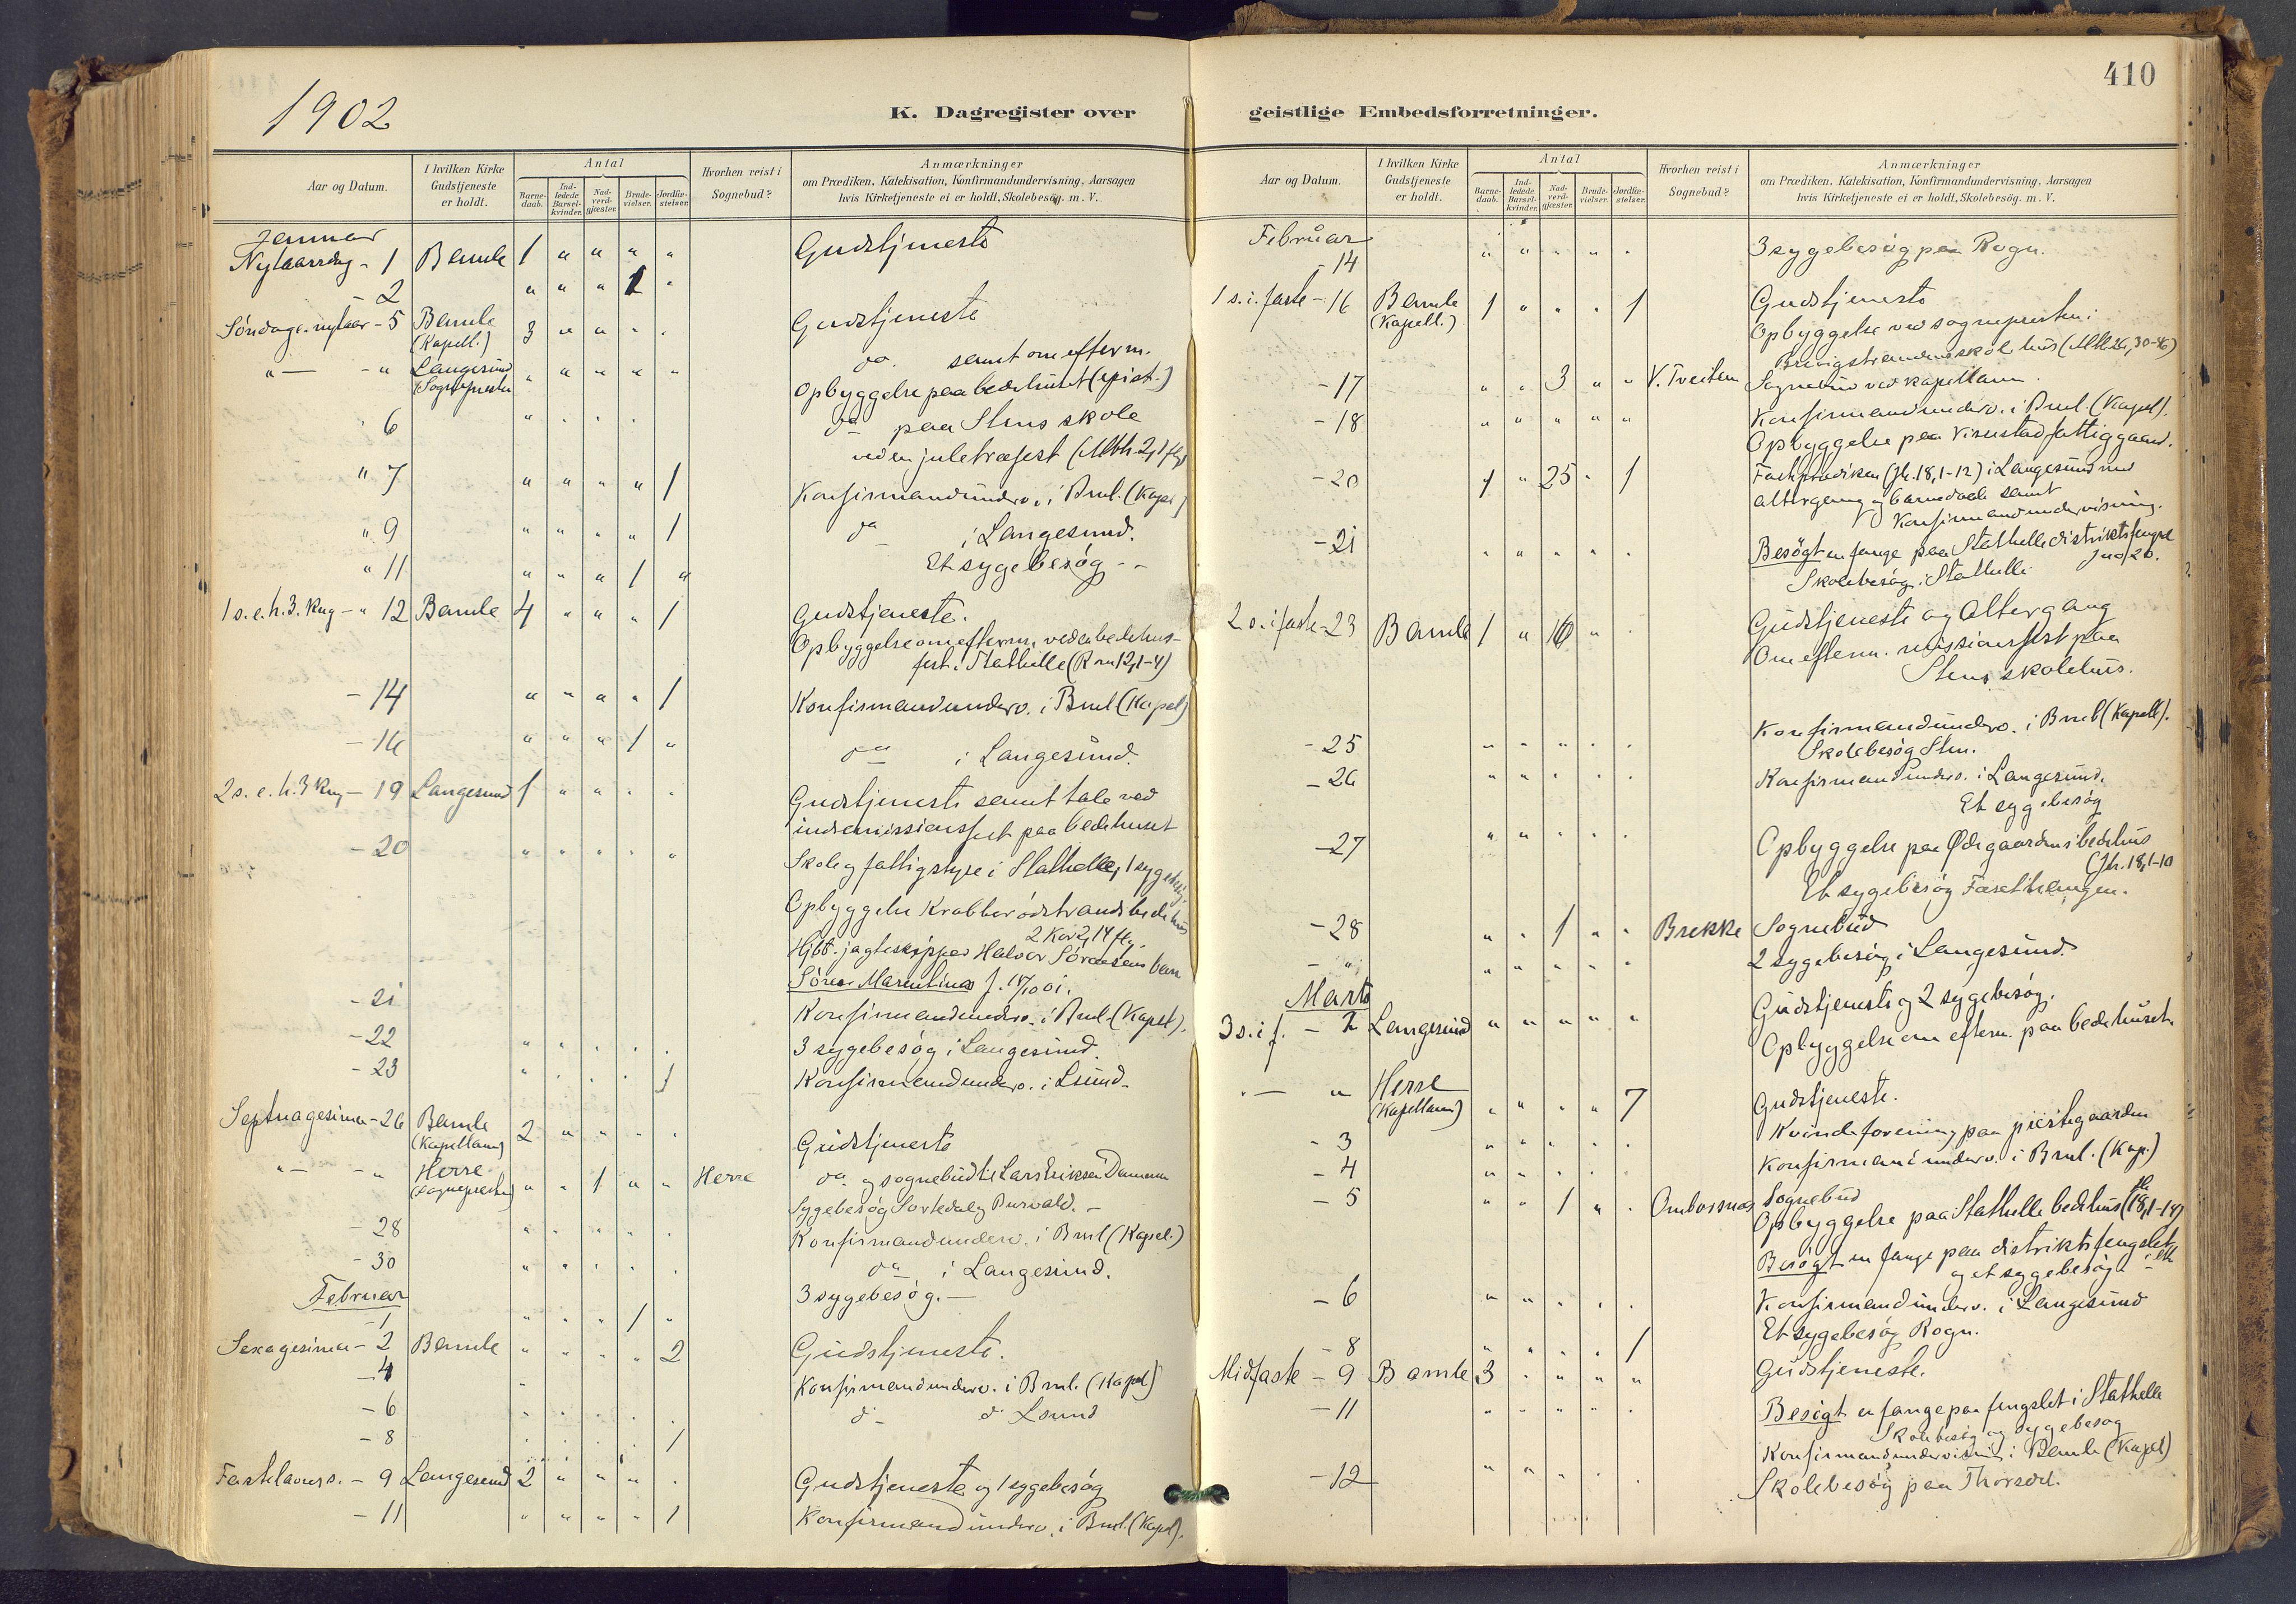 SAKO, Bamble kirkebøker, F/Fa/L0009: Ministerialbok nr. I 9, 1901-1917, s. 410